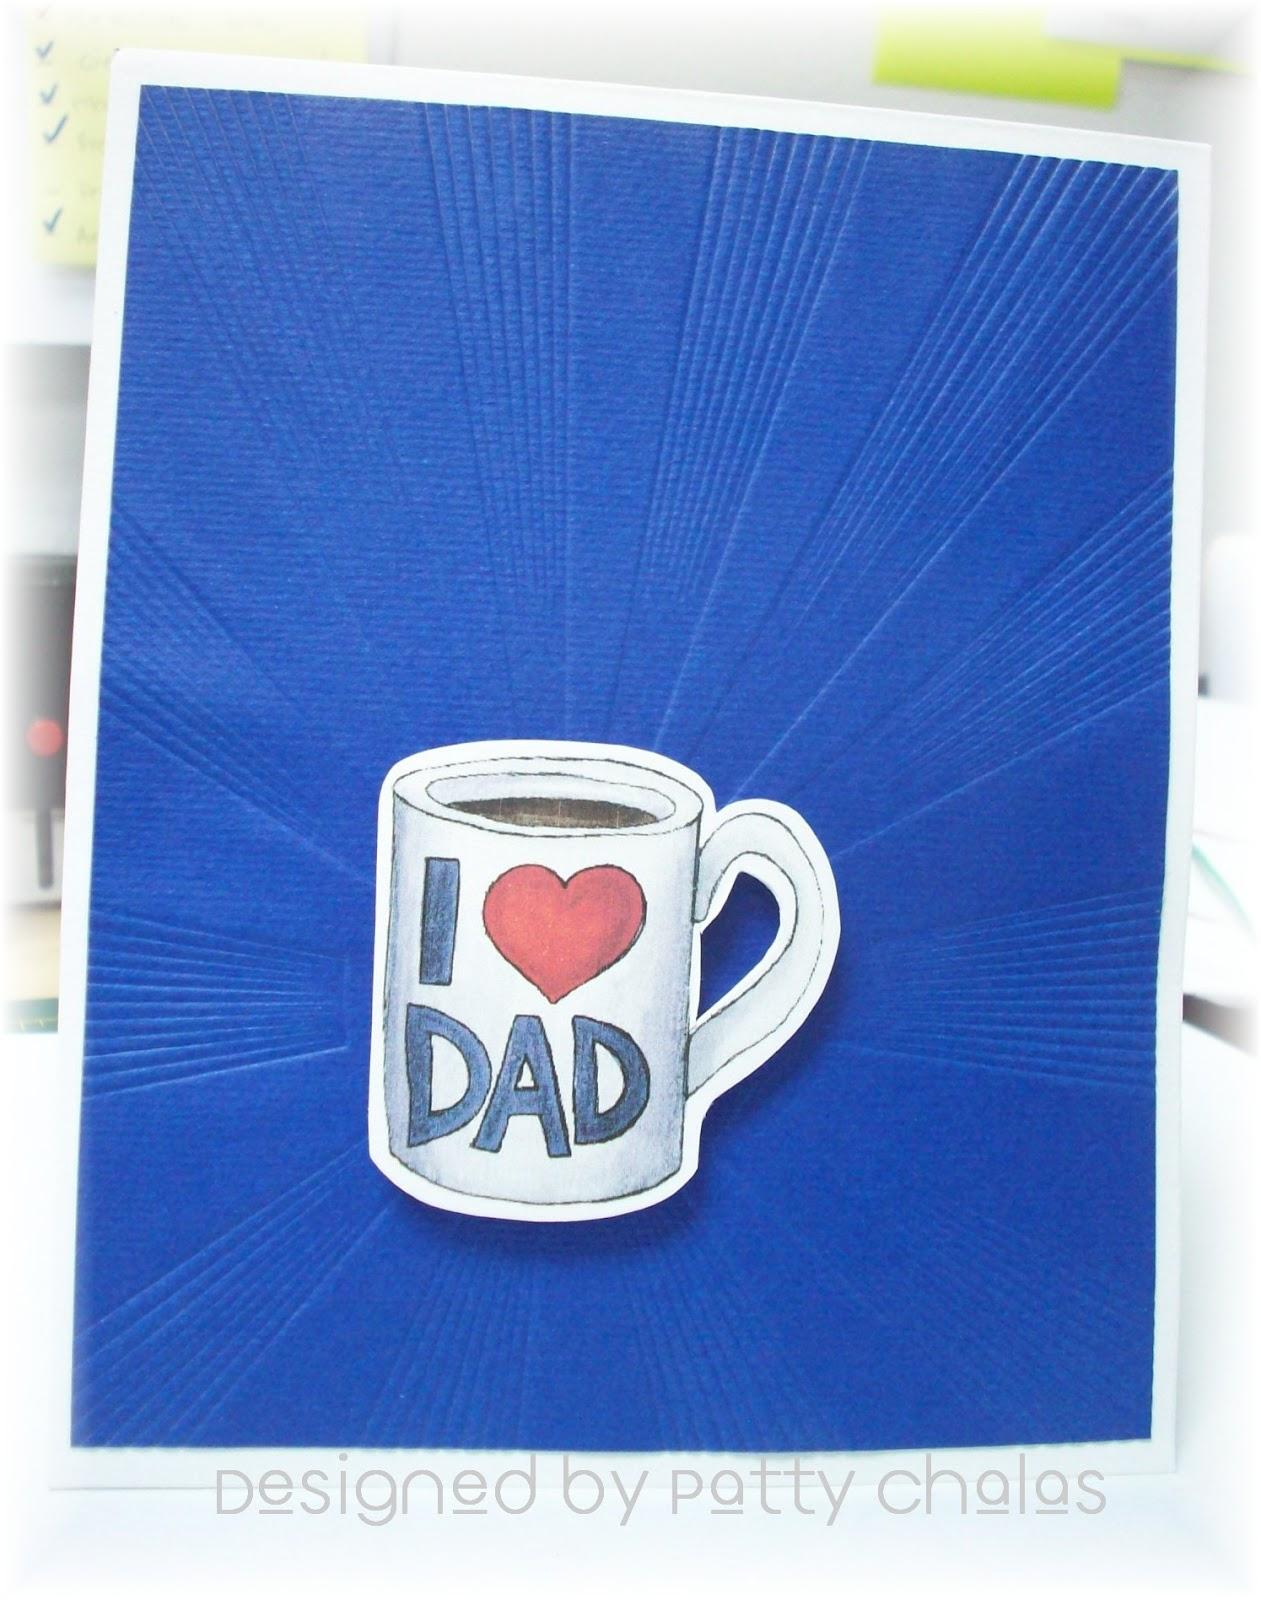 http://2.bp.blogspot.com/-IVgWmKiHXX8/T_WUV7XBqQI/AAAAAAAADJw/-p9mTXW8Egk/s1600/I+love+my+DAD.jpg